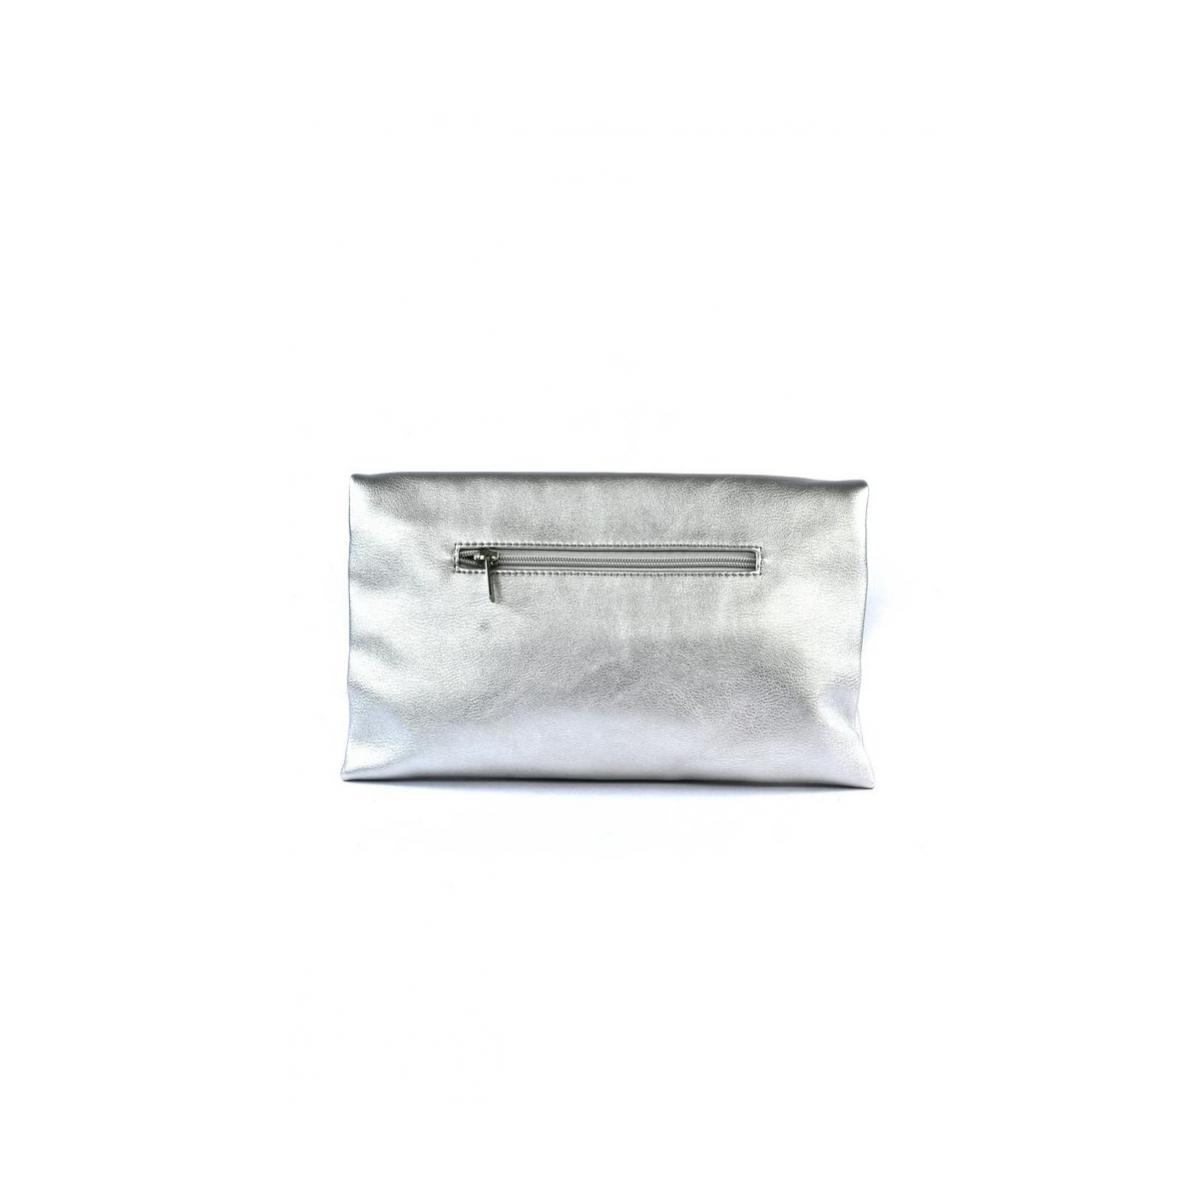 b1cb183efb Dámska listová strieborná kabelka LETTY - 3